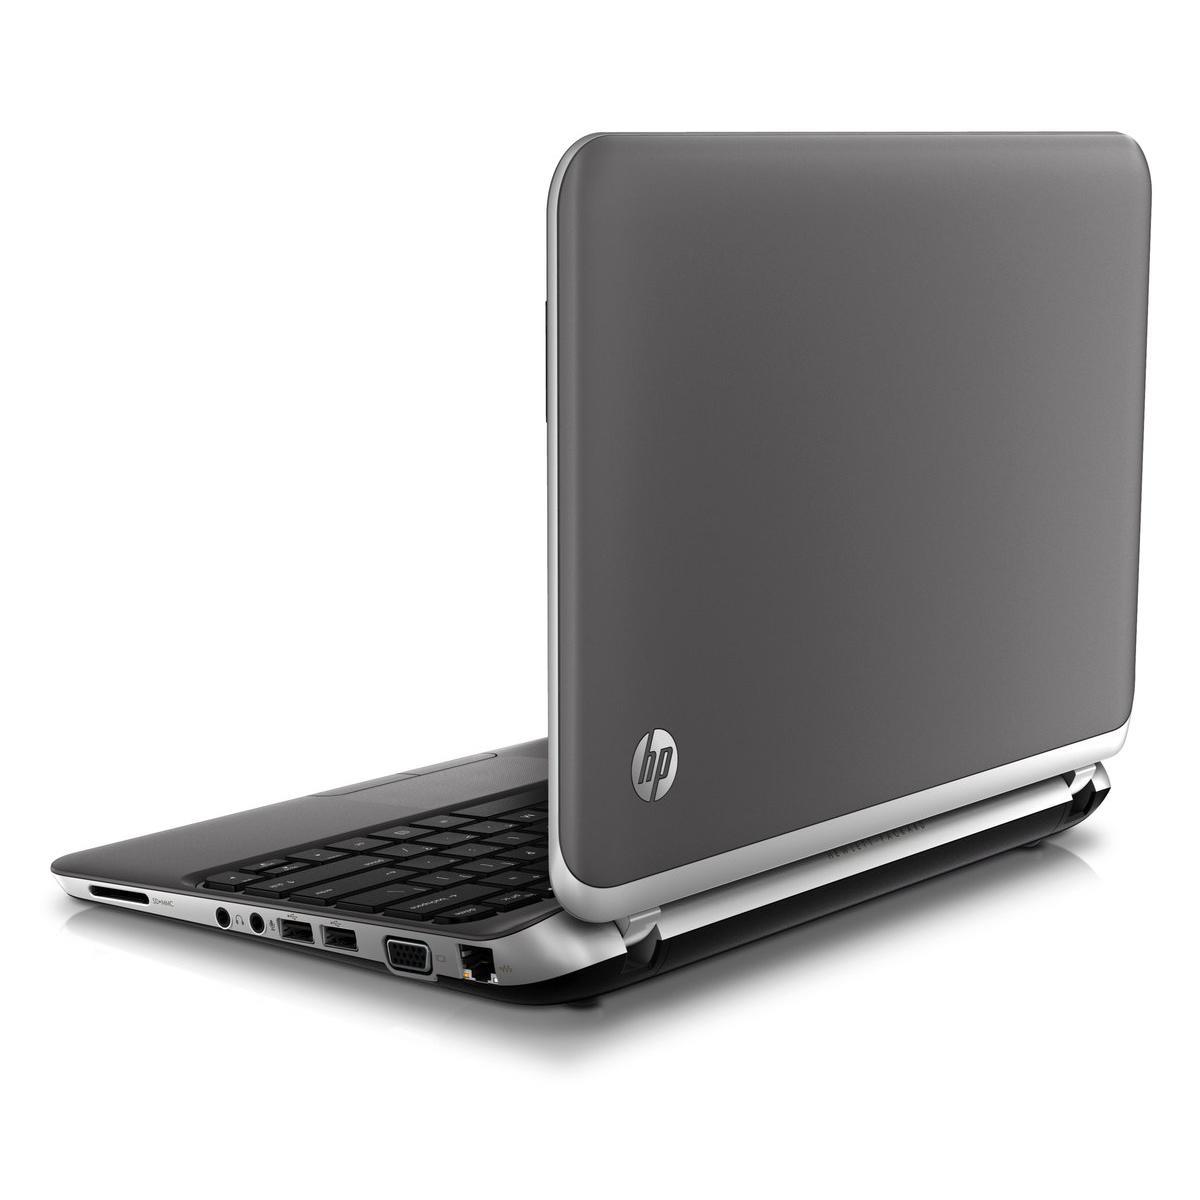 Hp Notebook 3125 11-inch (2012) - E2-1800 - 4 GB  - HDD 320 GB